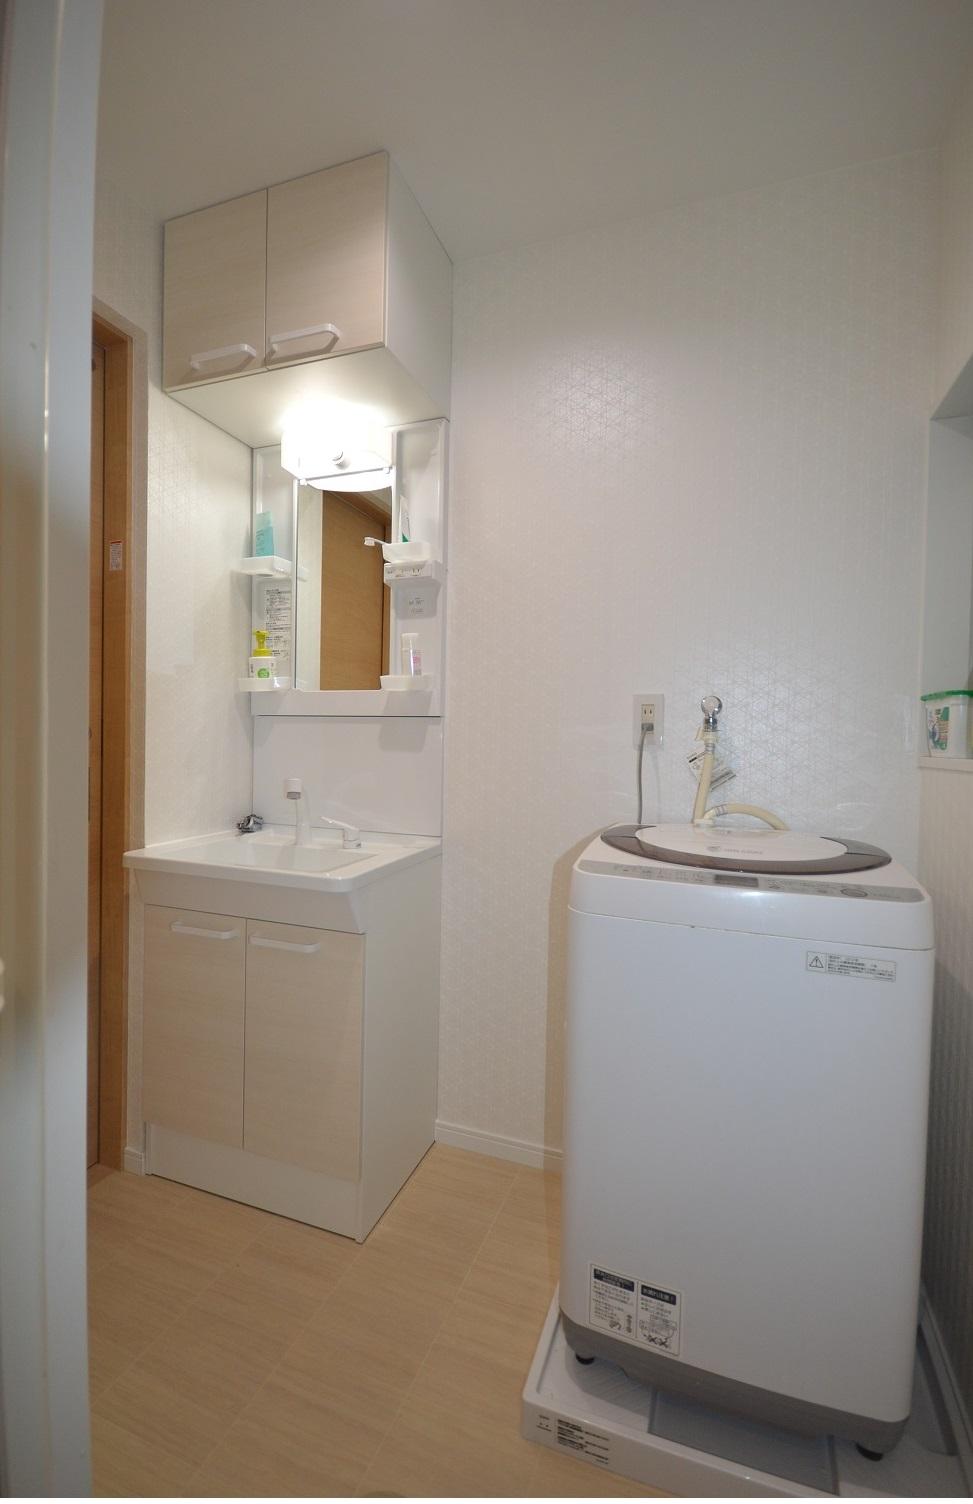 After:洗面化粧台と洗濯機の間には収納用品を設置予定